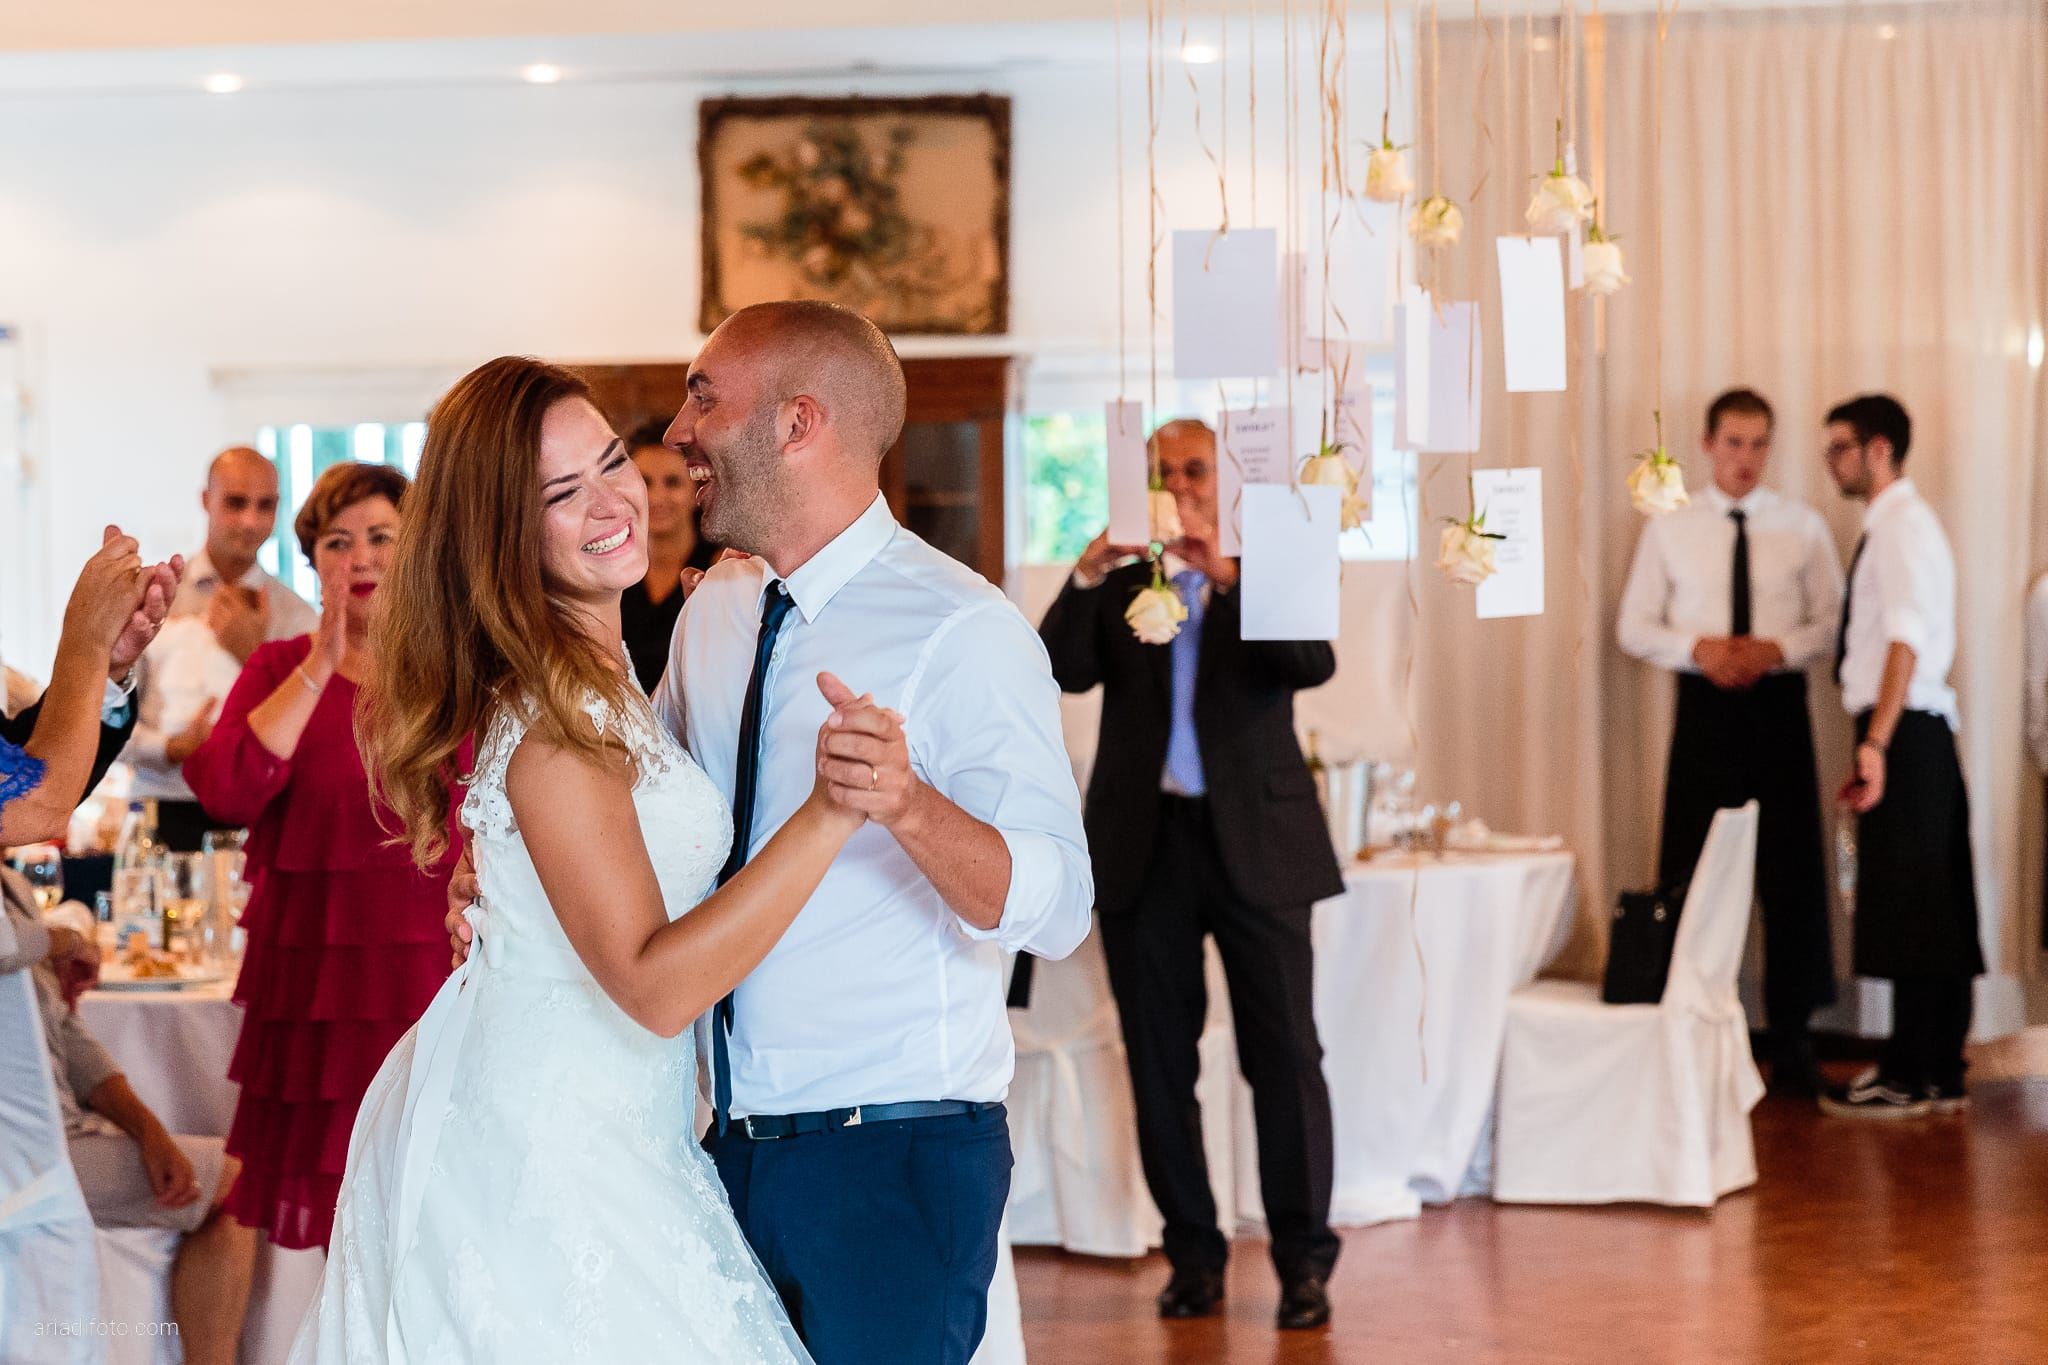 Giorgia Davide Matrimonio Villa Revoltella Salvia Rosmarino Trieste ricevimento primo ballo